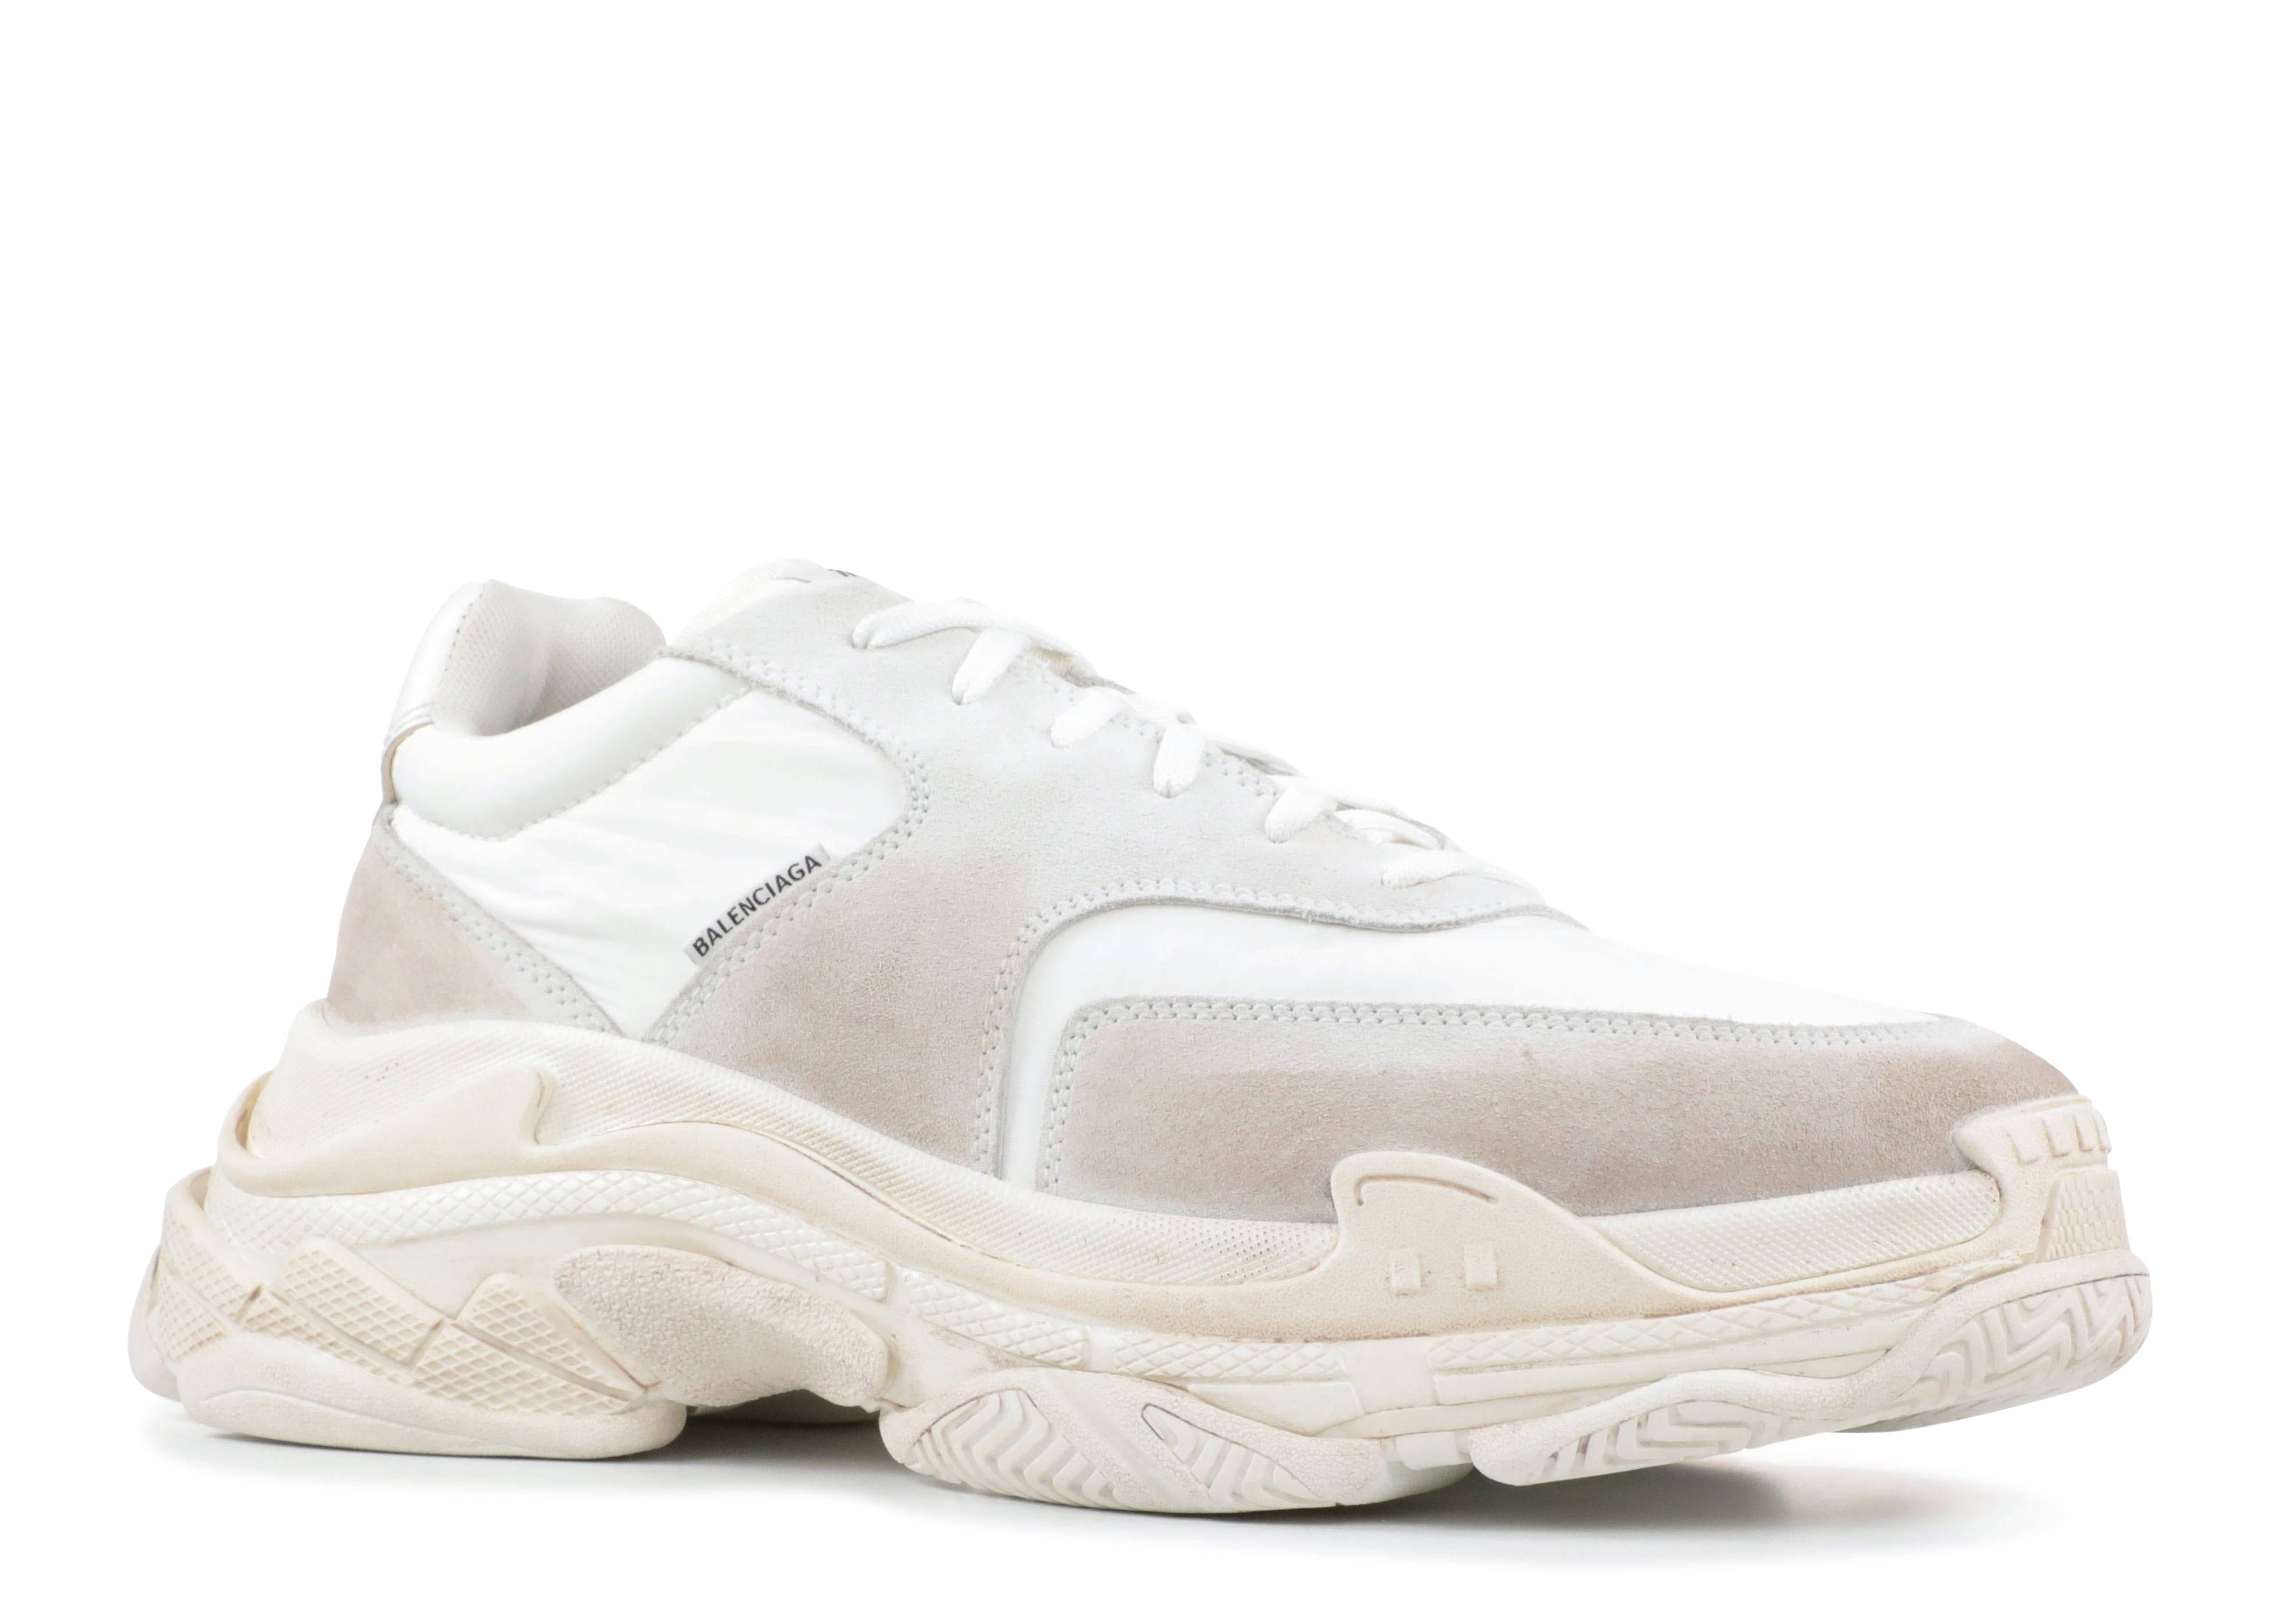 Balenciaga triple s white suede » Support